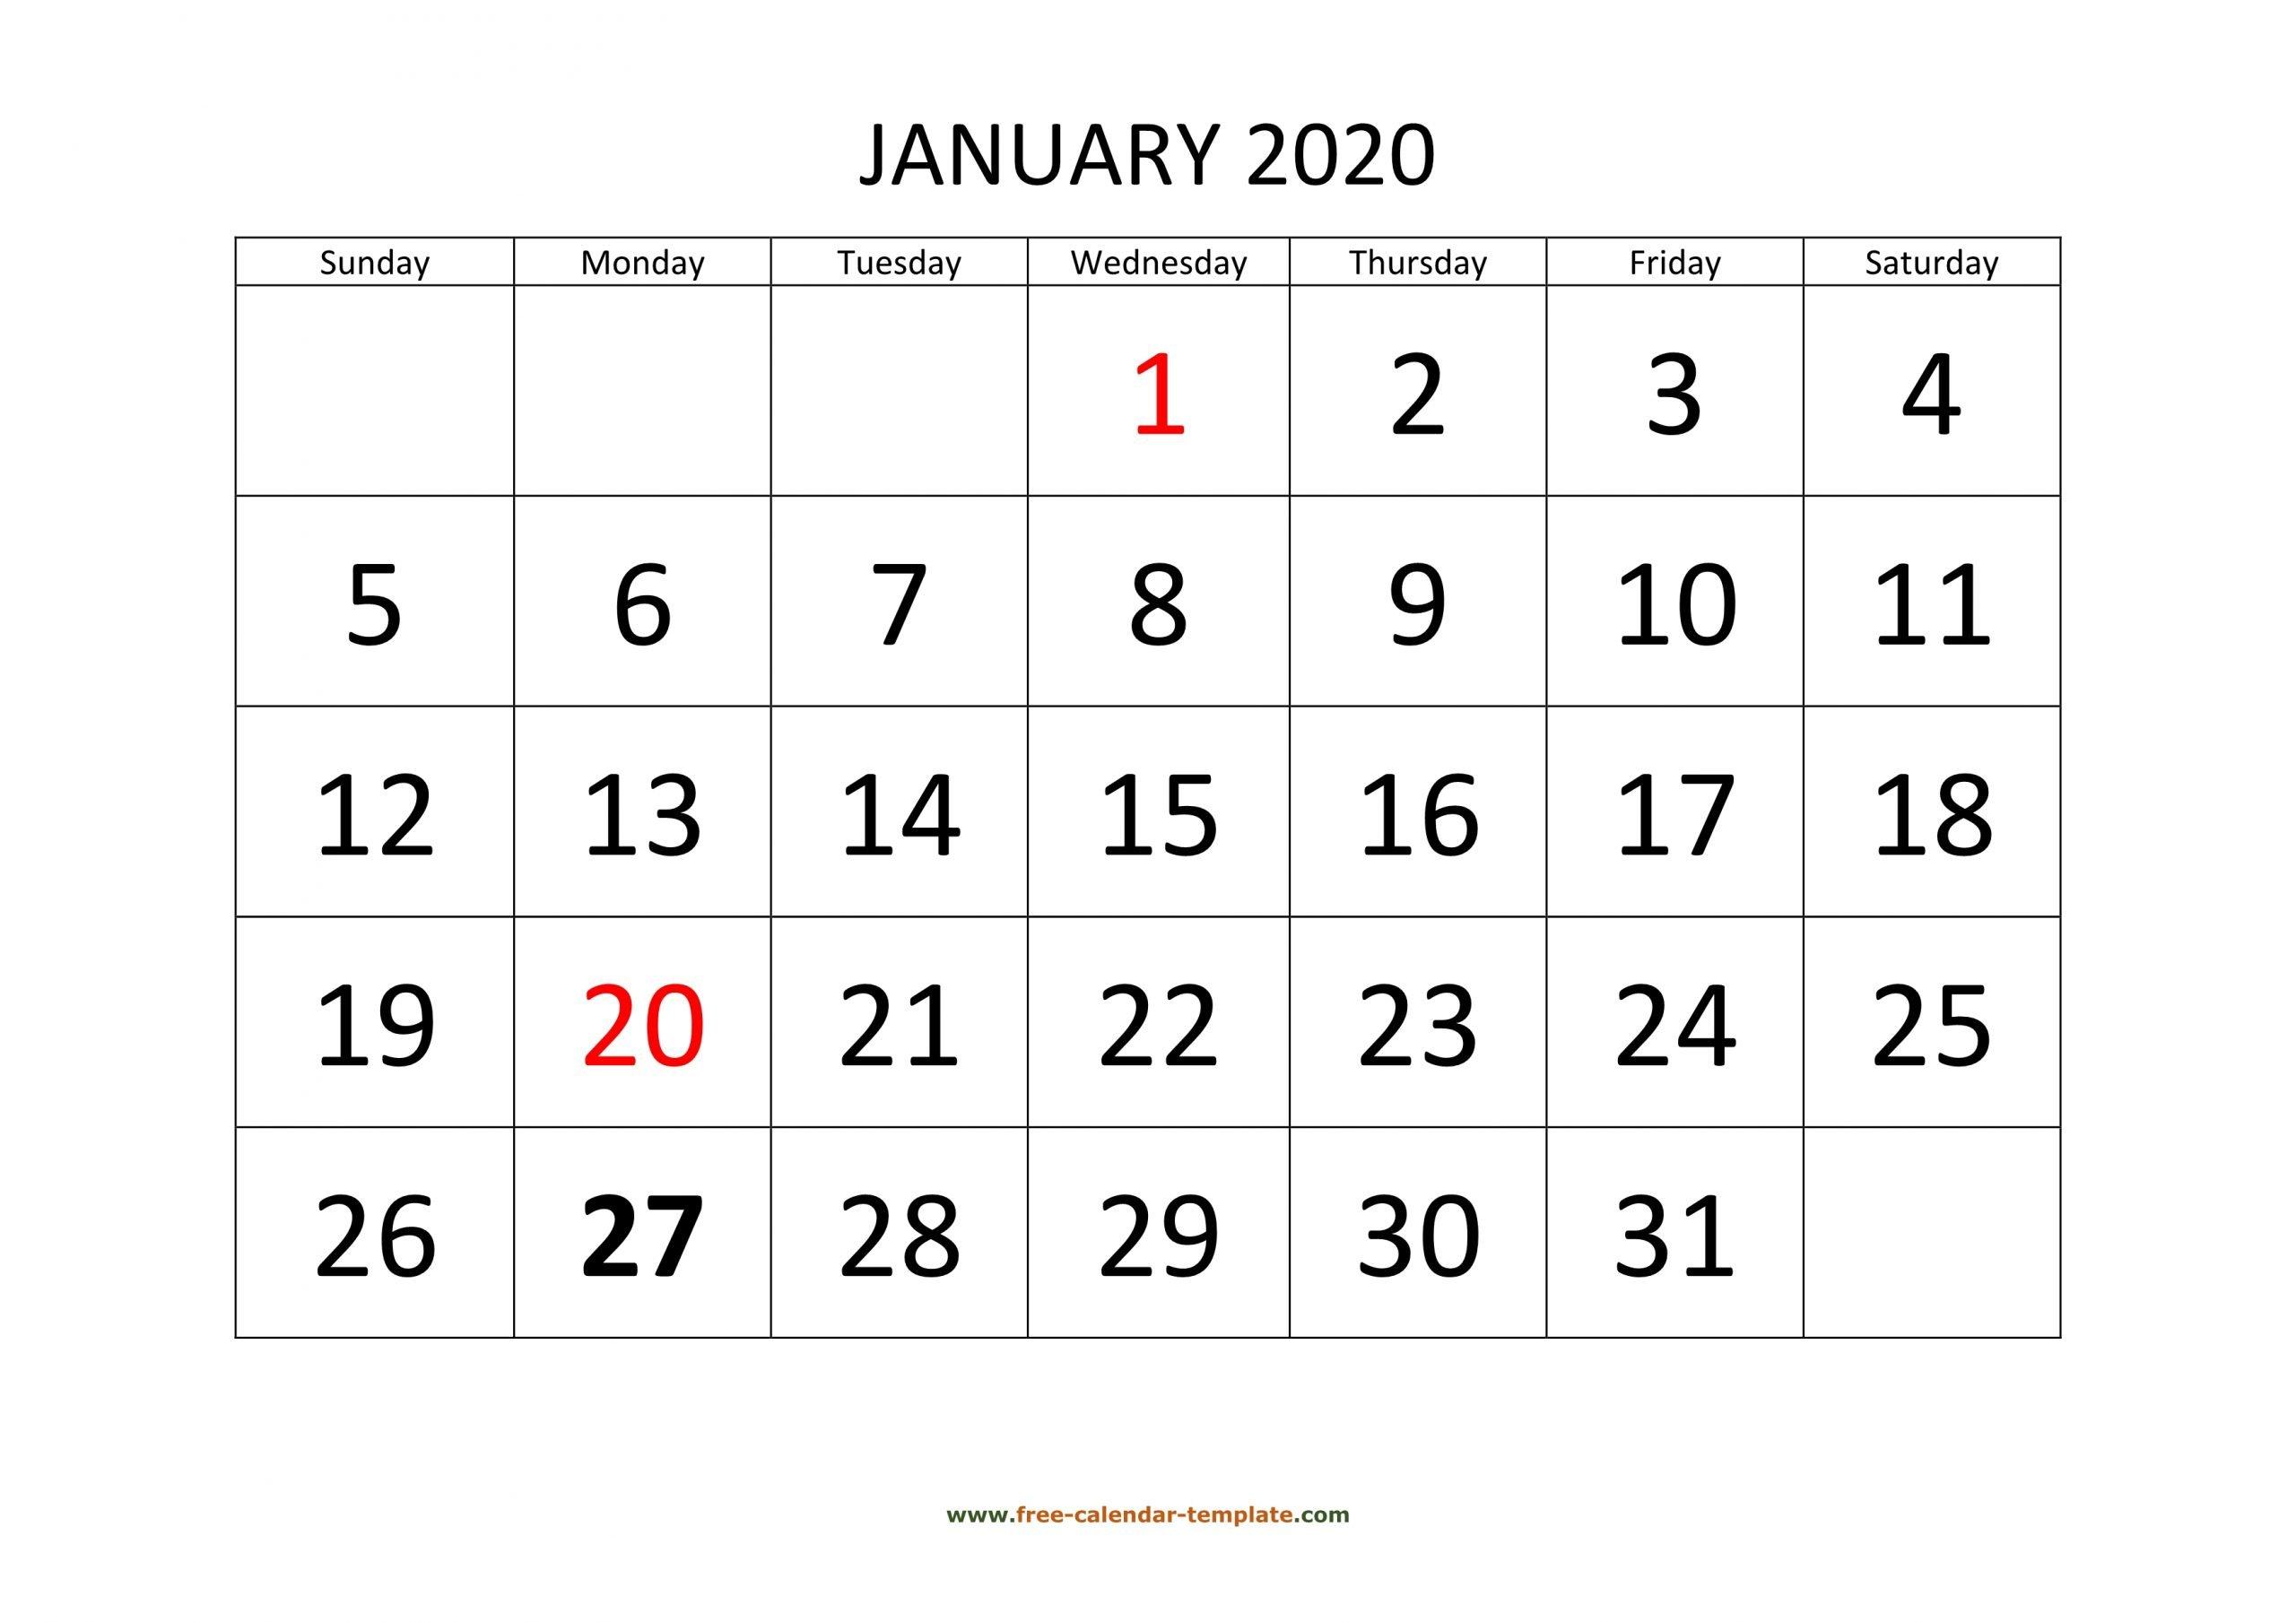 Get 2020 Printable Calendar Full Page 2 December 2020 in Free Printable December January Calendar Graphics